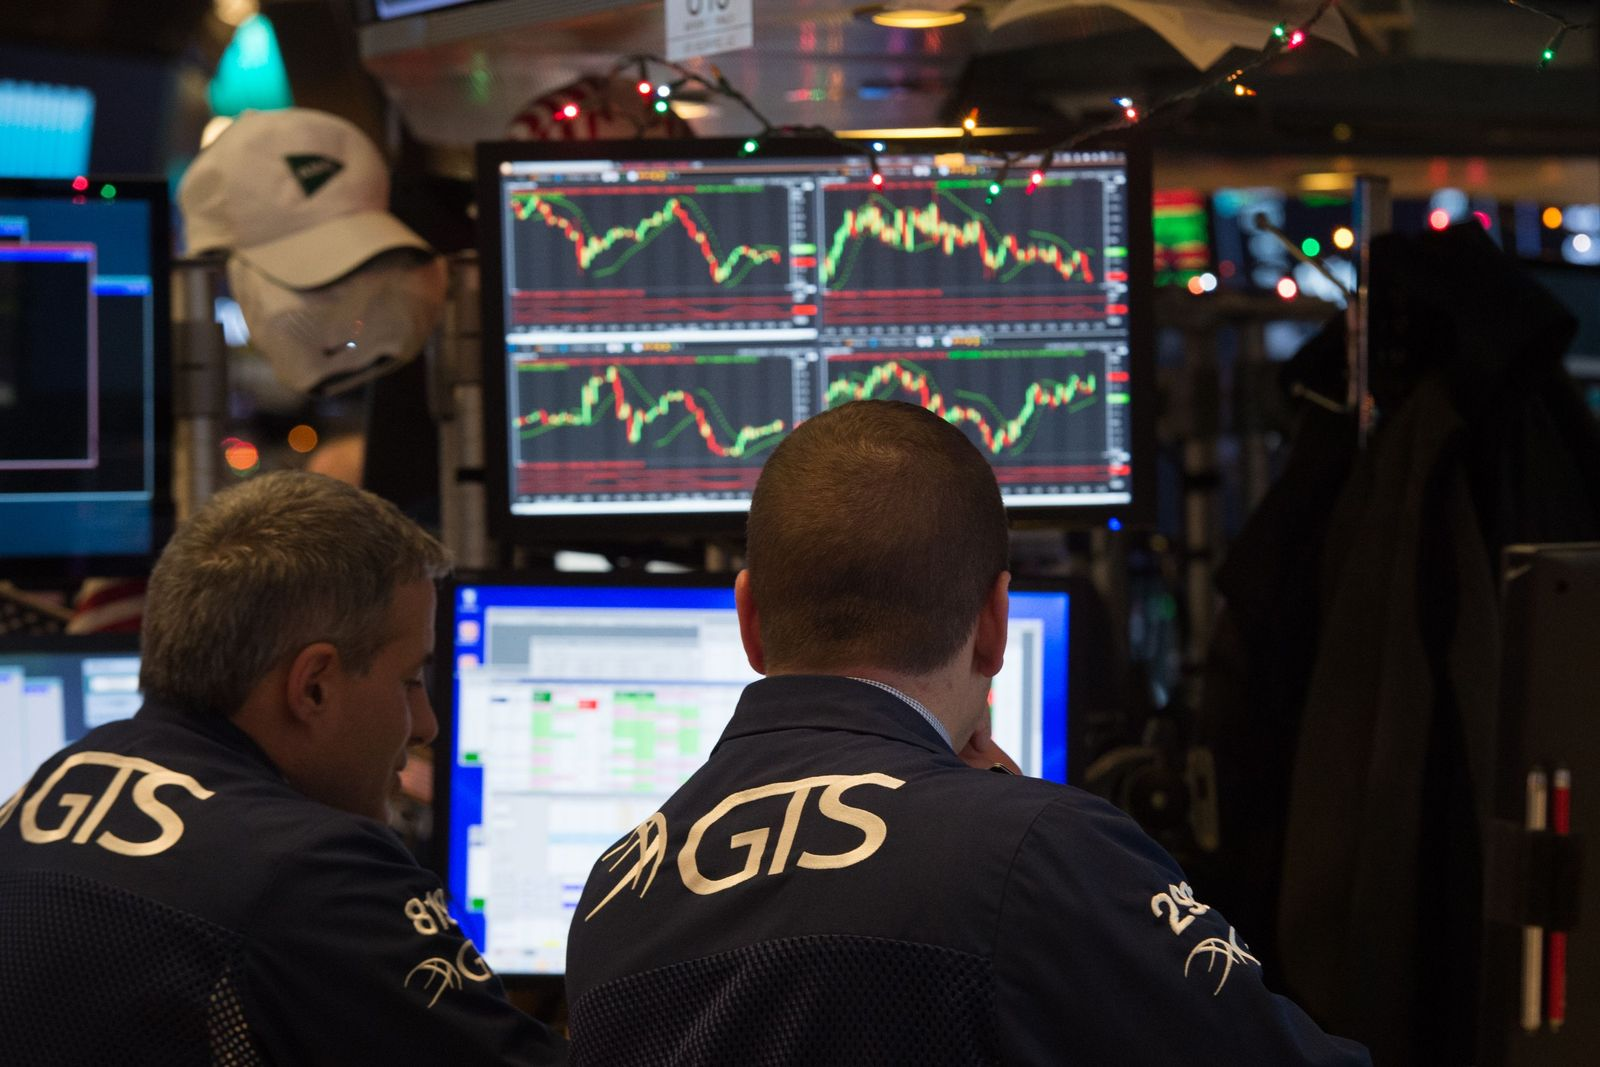 Konjunktur Börse/ US-WALL STREET-NYSE-STOCK-CLOSING